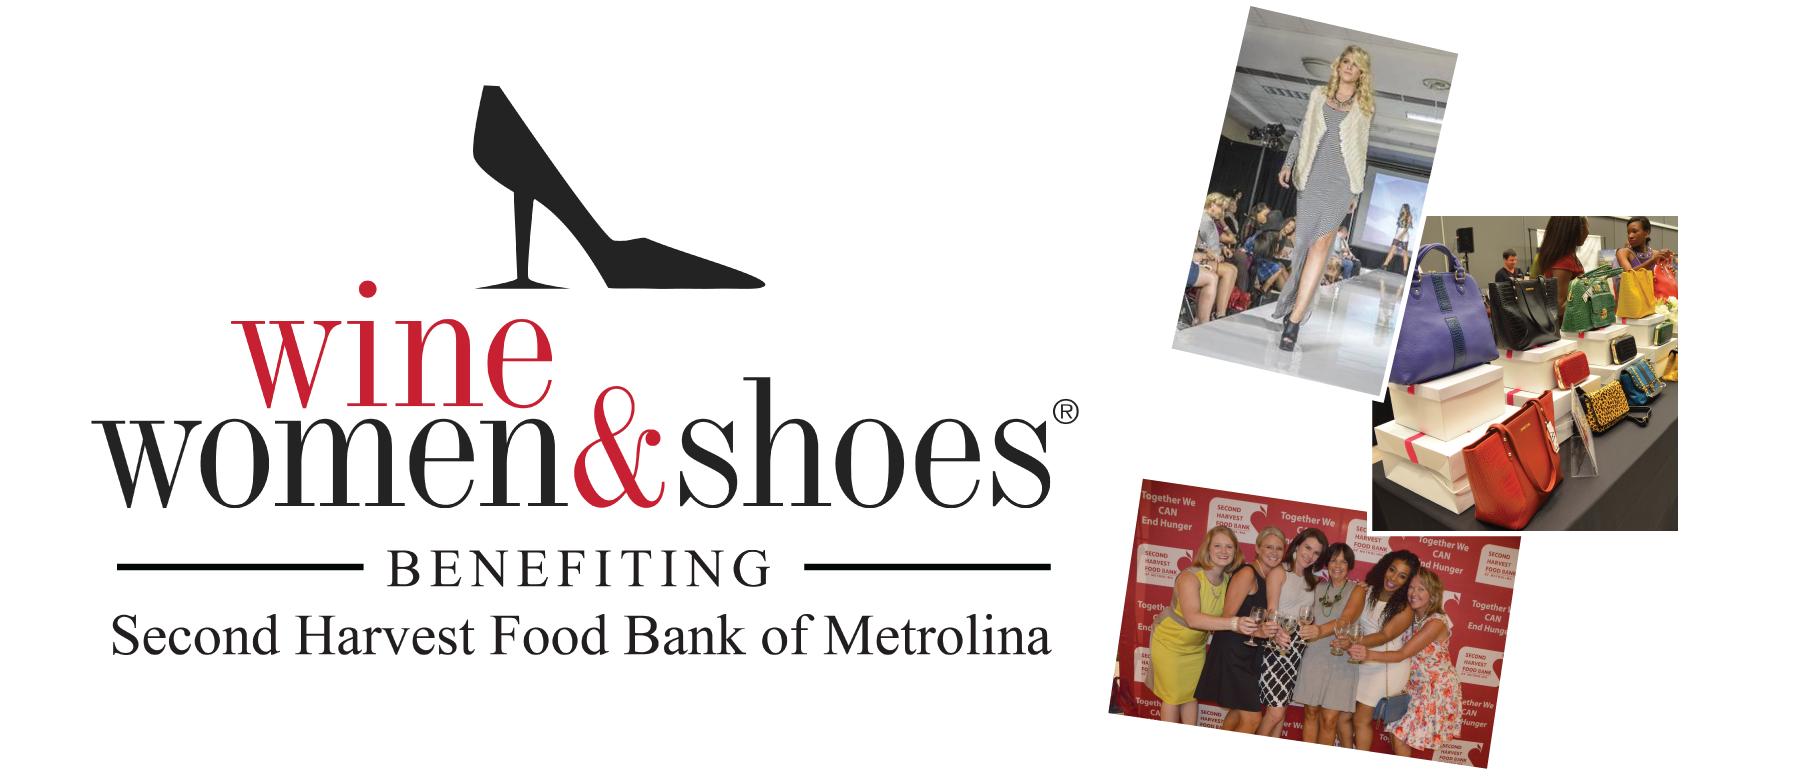 Wine, Women & Shoes on Sept. 21 benefits Second Harvest Food Bank of Metrolina.